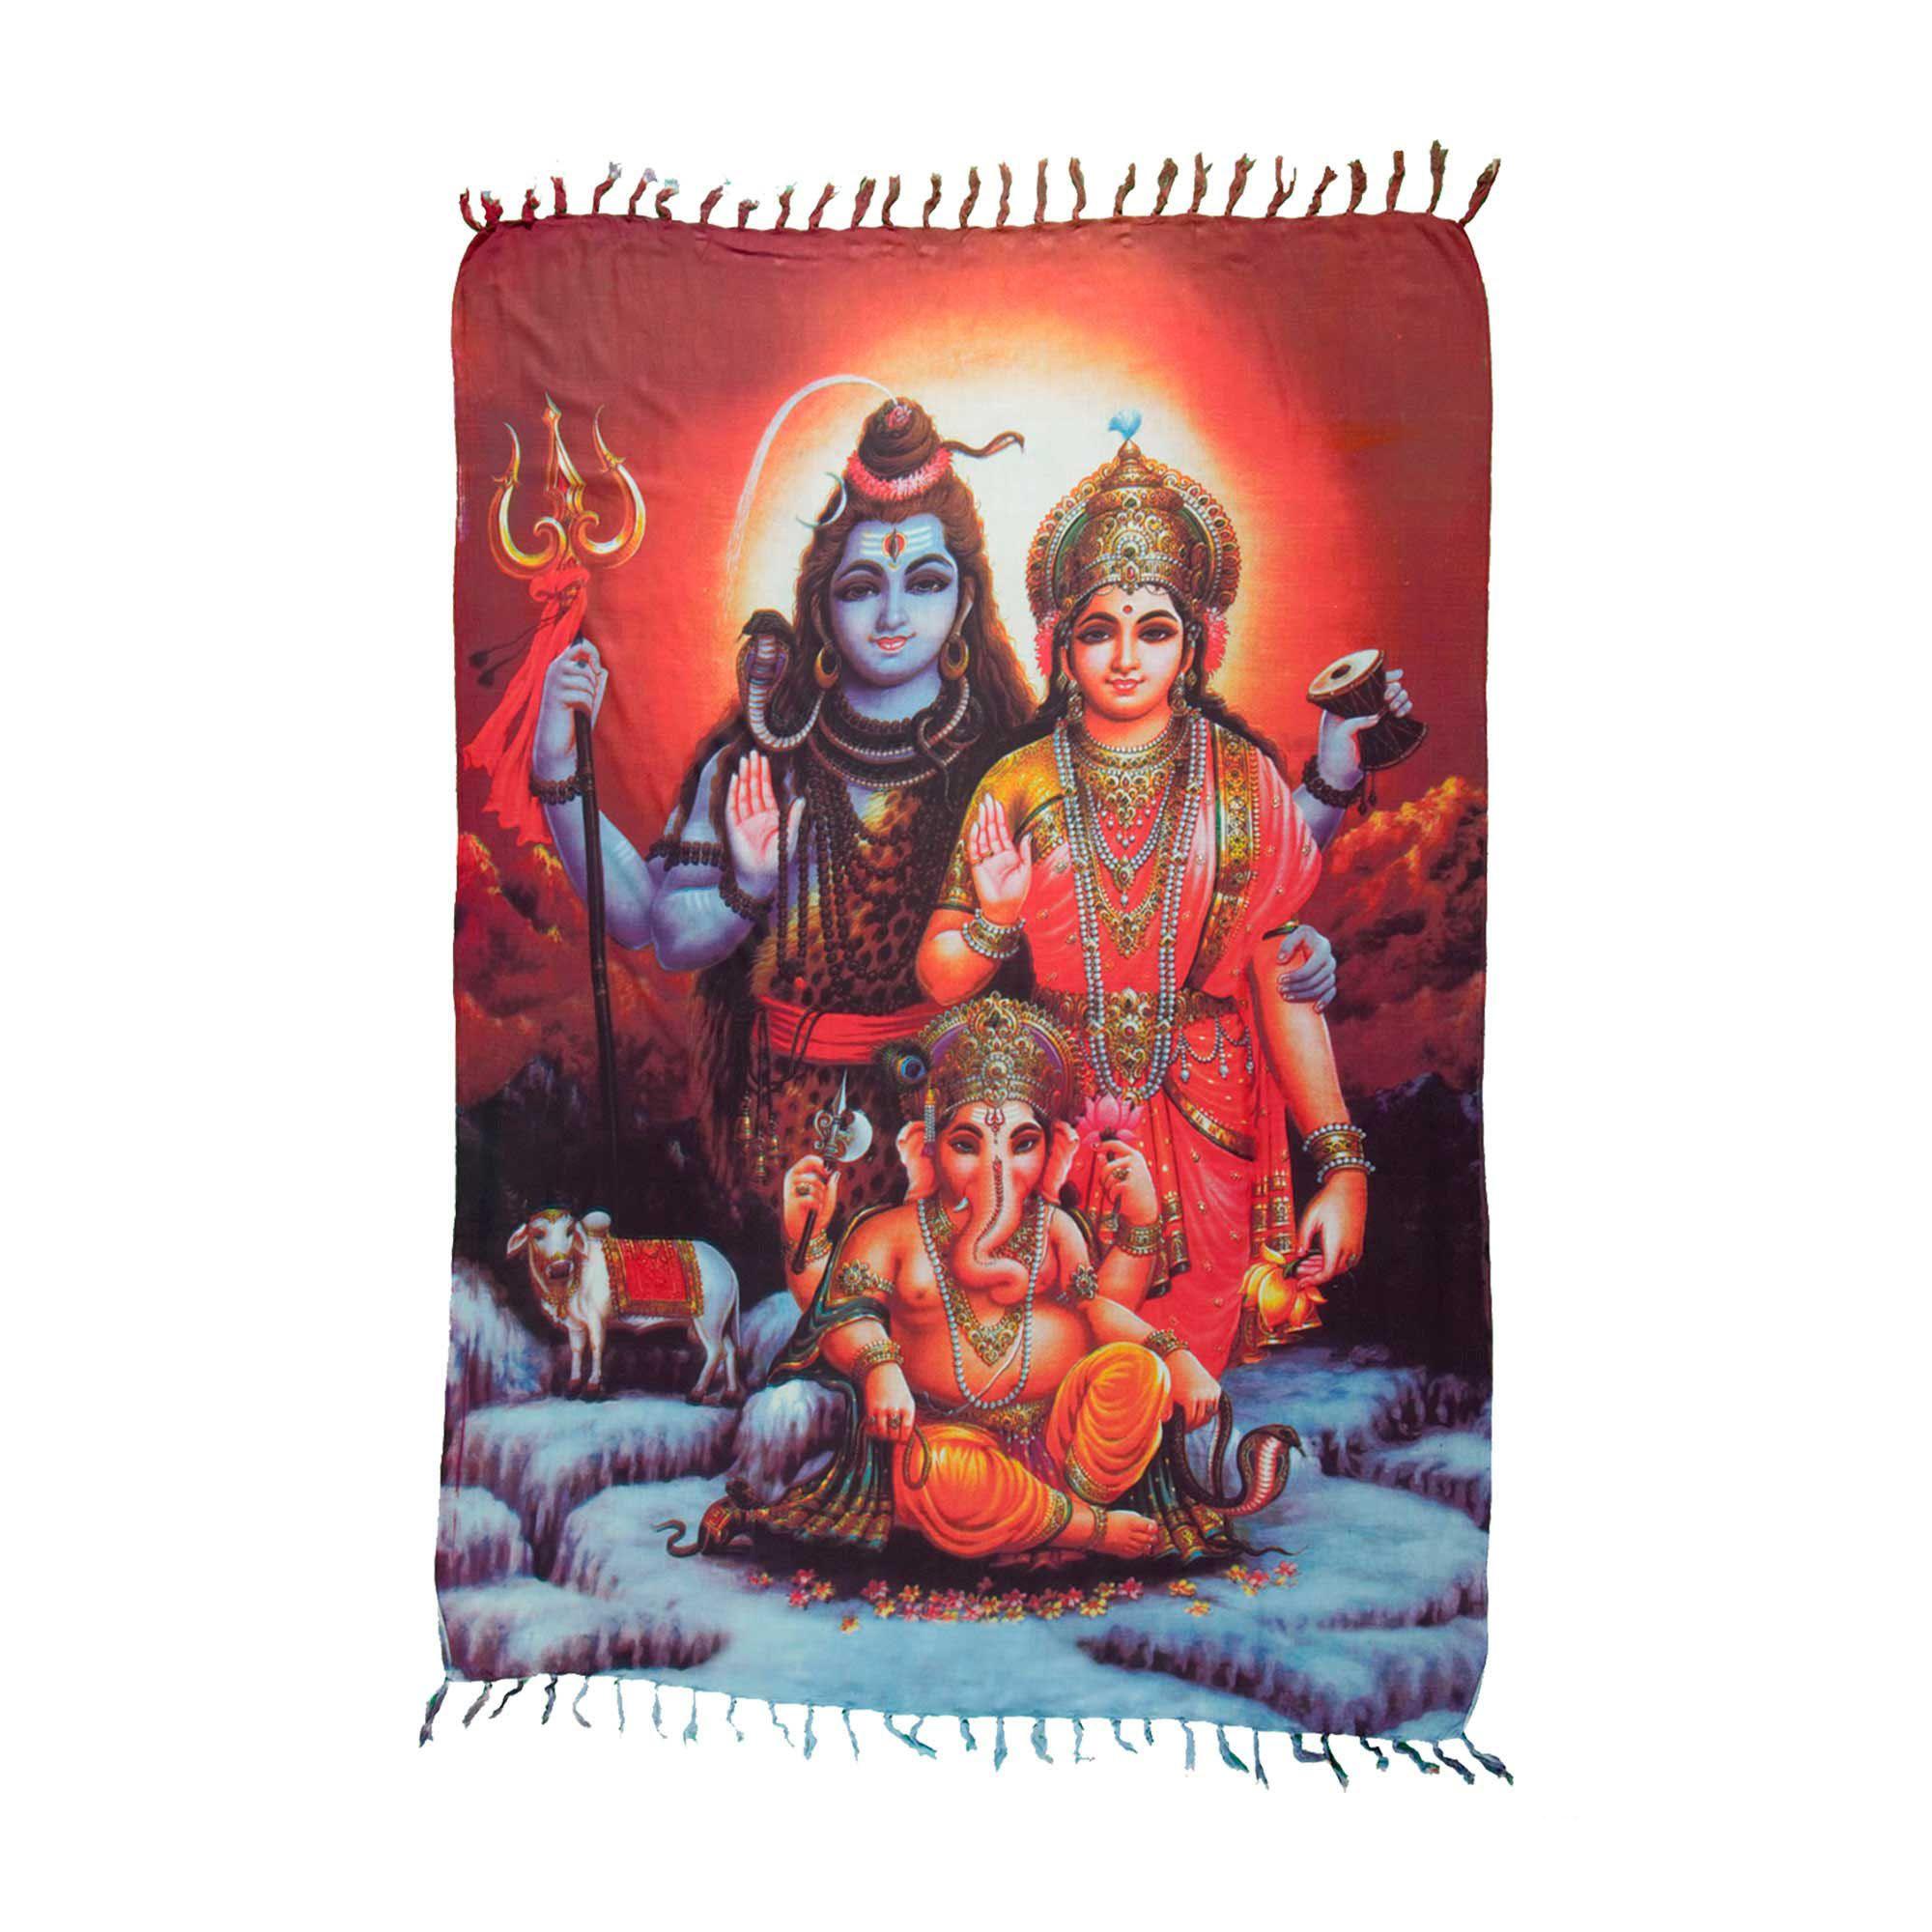 Canga Tiga Dewa - Shiva, Parvati e Ganesha